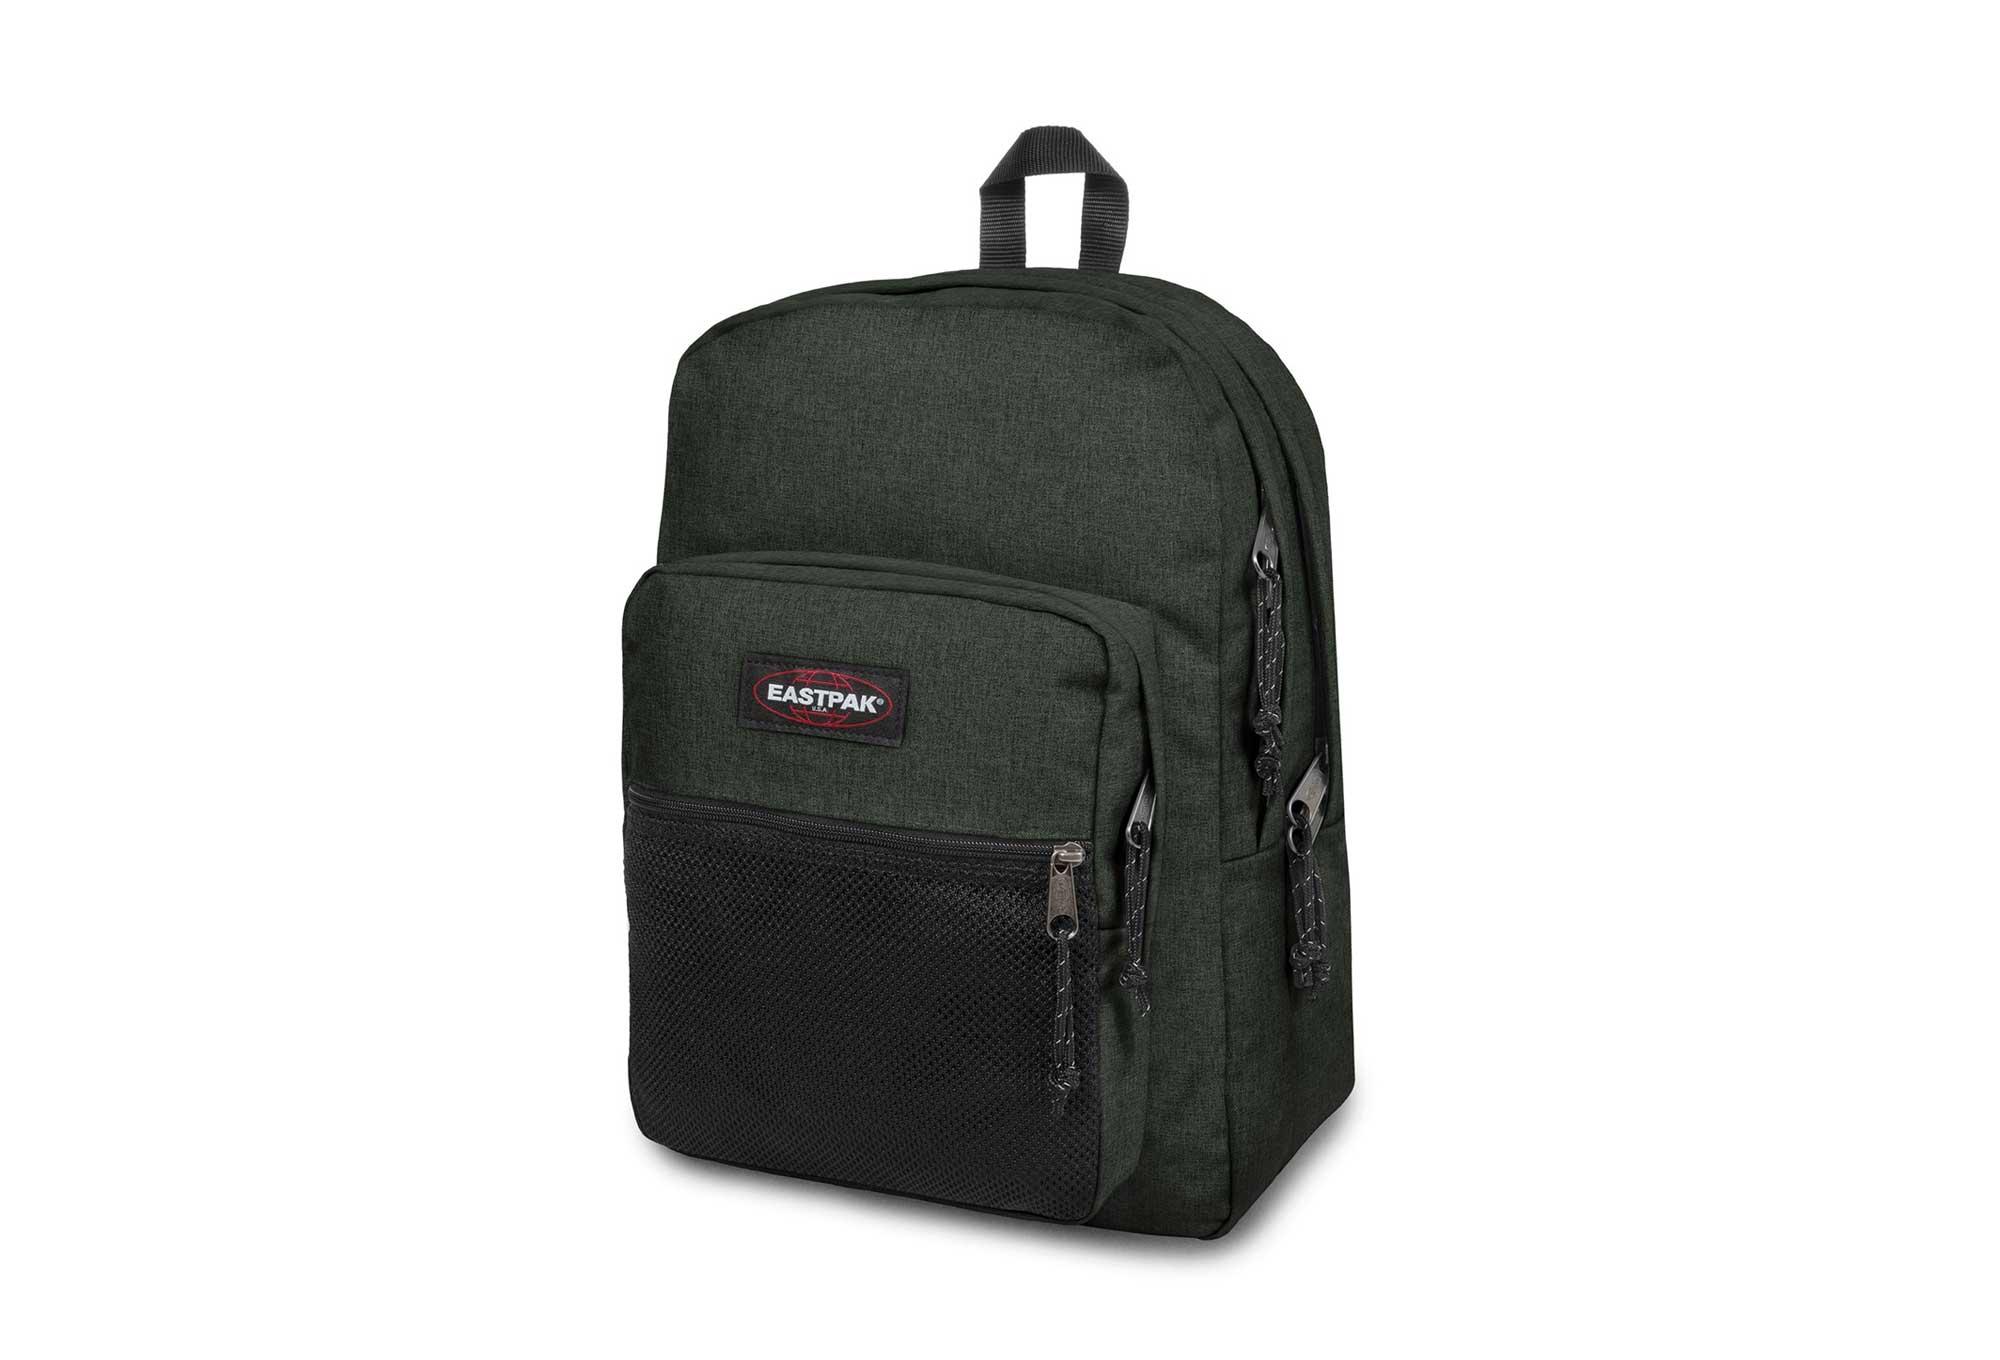 Eastpak Pinnacle Crafty Moss Backpack